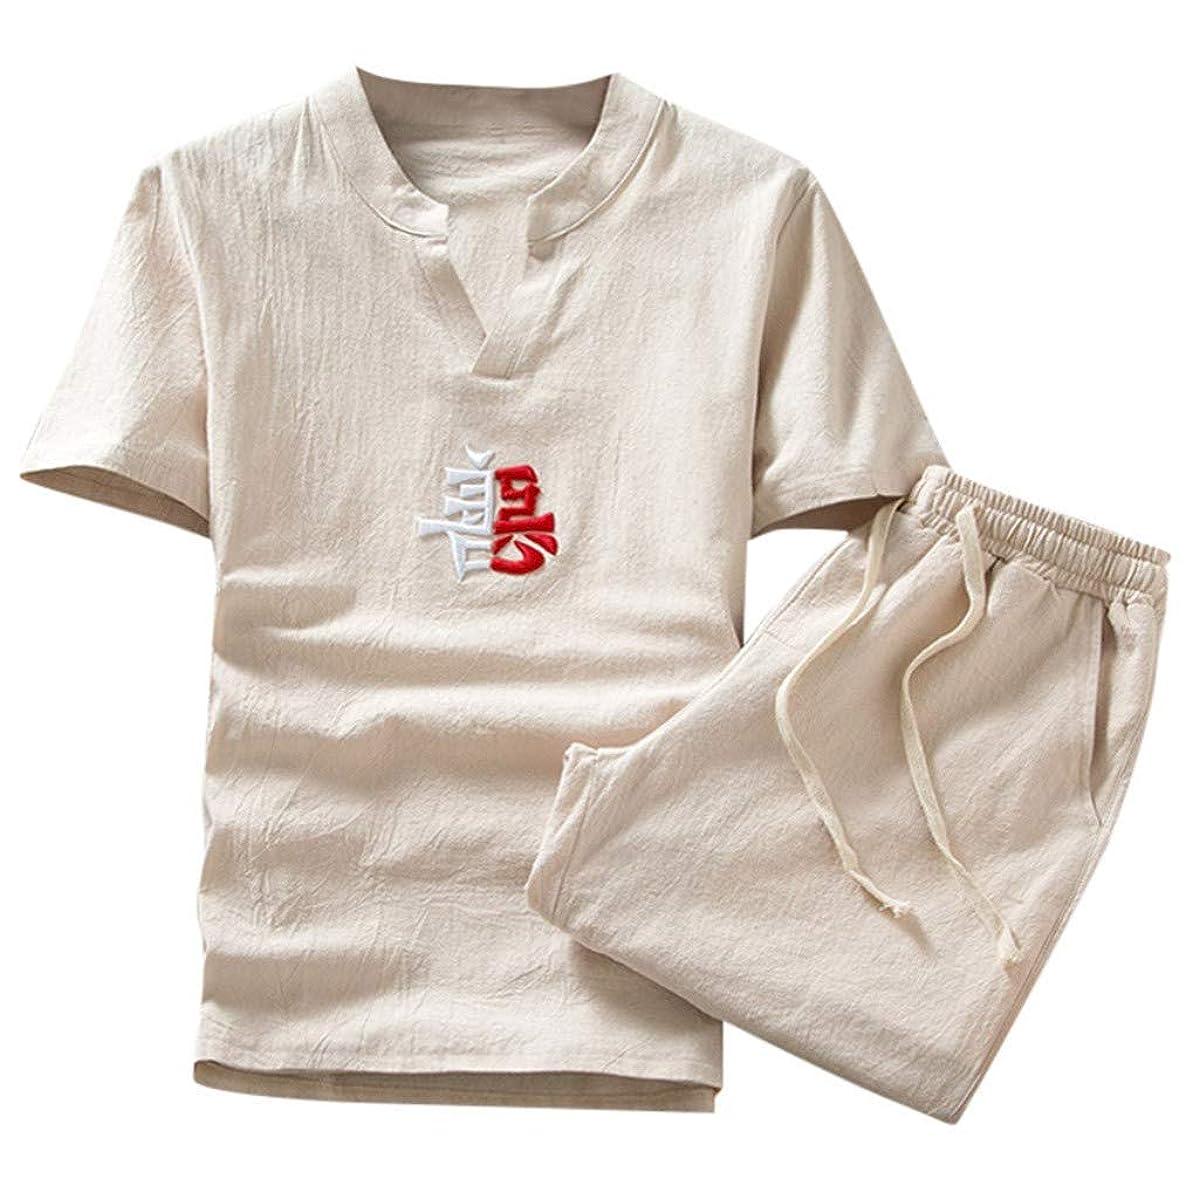 Cotton Linen Sets for Men Summer Short Sleeve and Shorts Yoga Pants Plus Size Embroidery Tshirt Beachwear